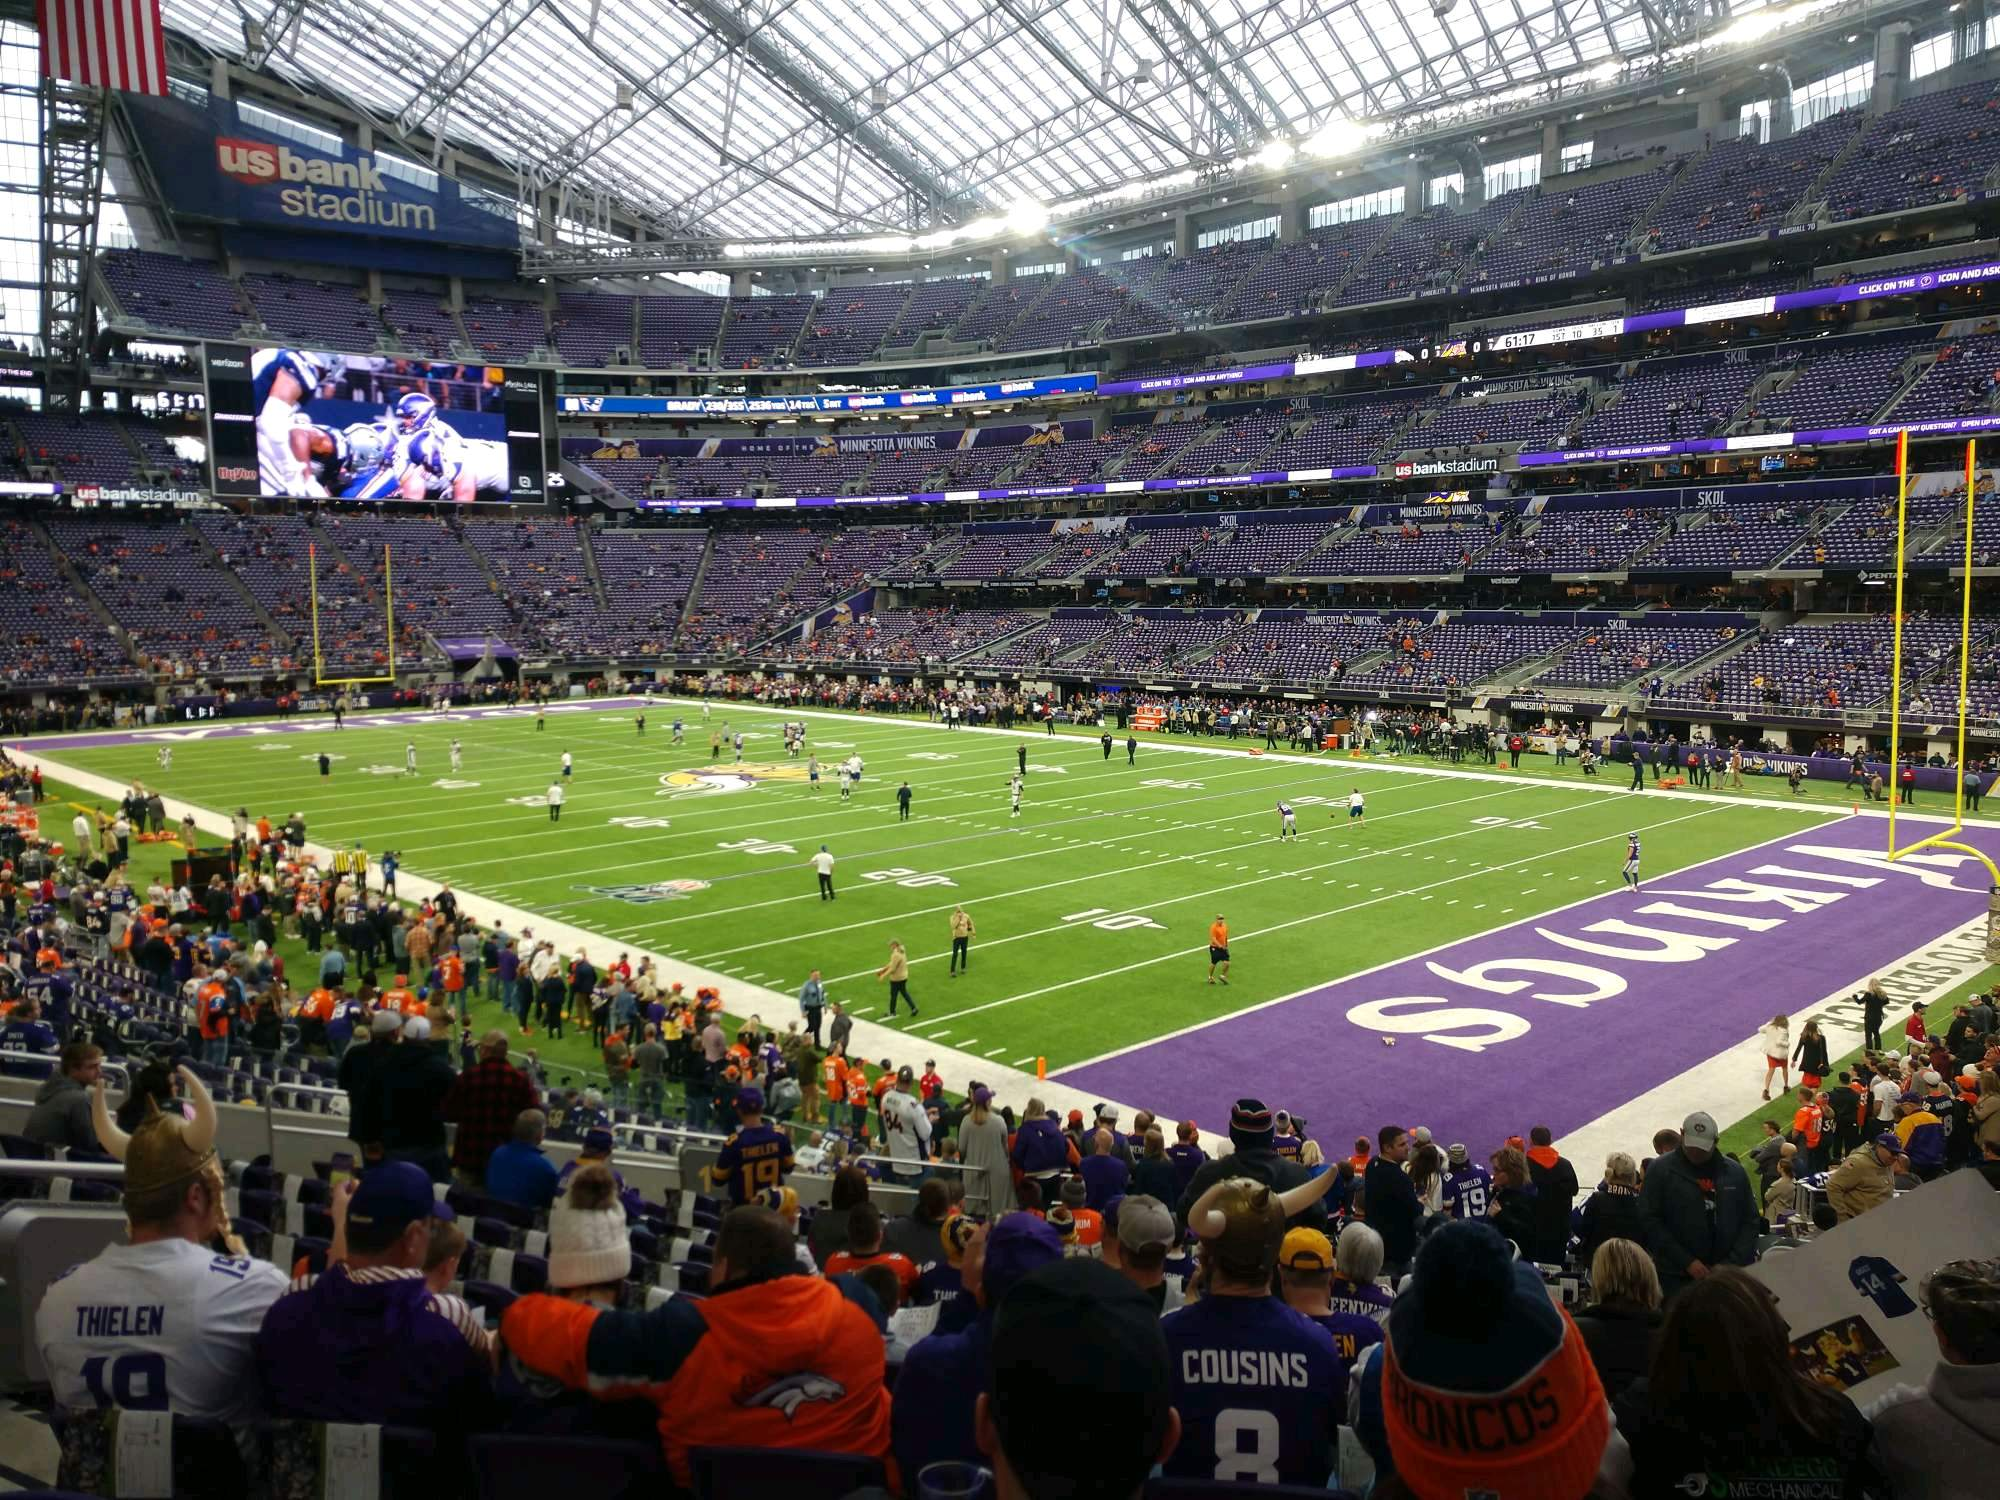 U.S. Bank Stadium Section 103 Row 22 Seat 11